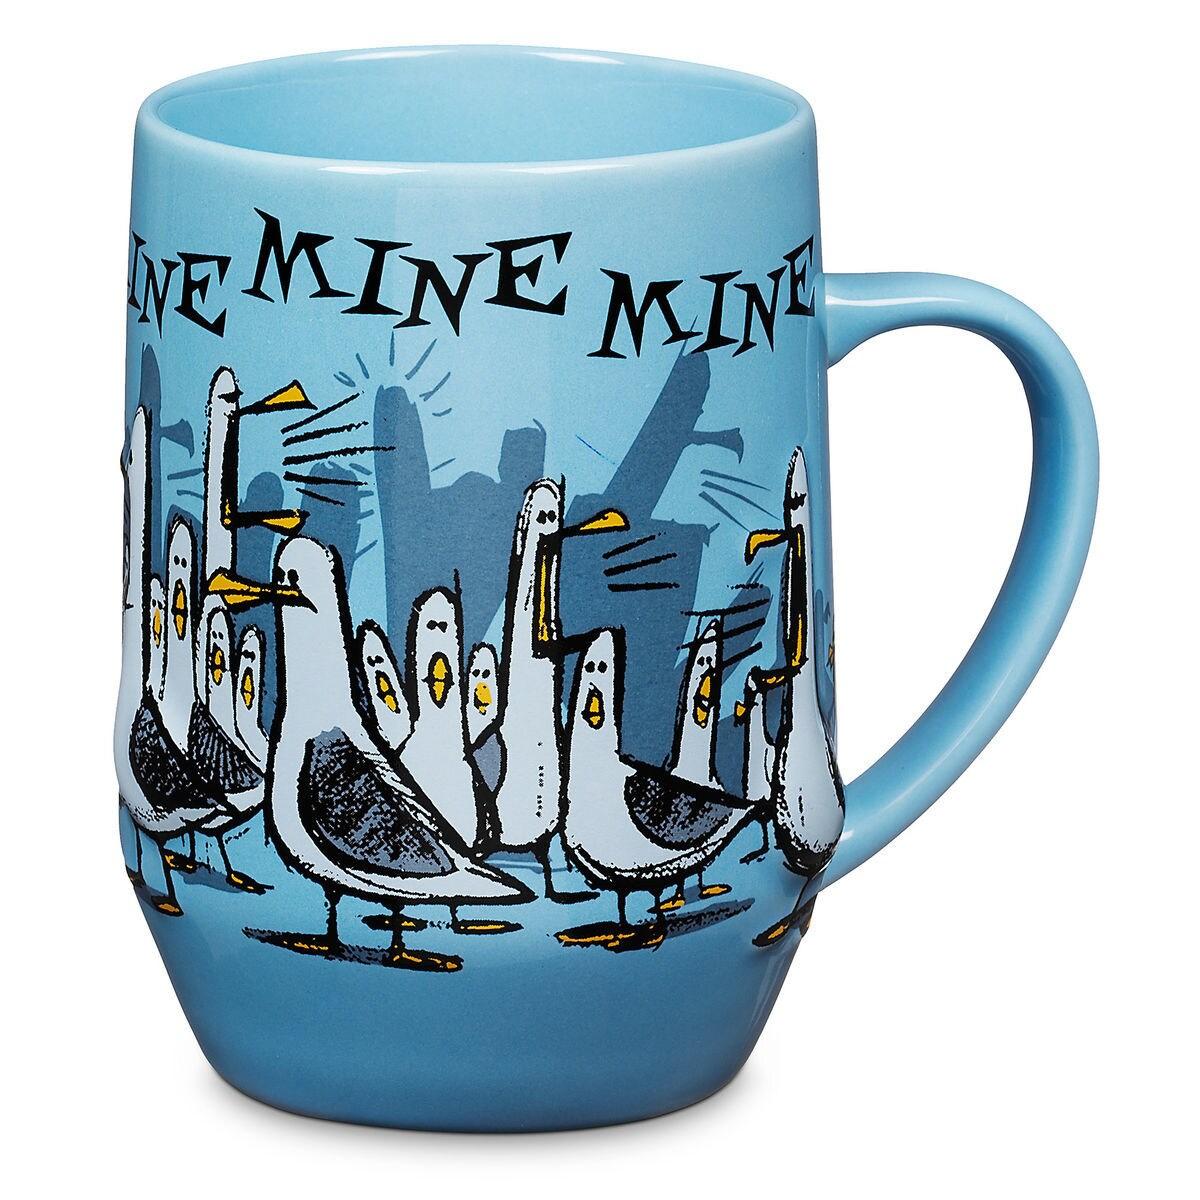 finding nemo seagulls mug shopdisney